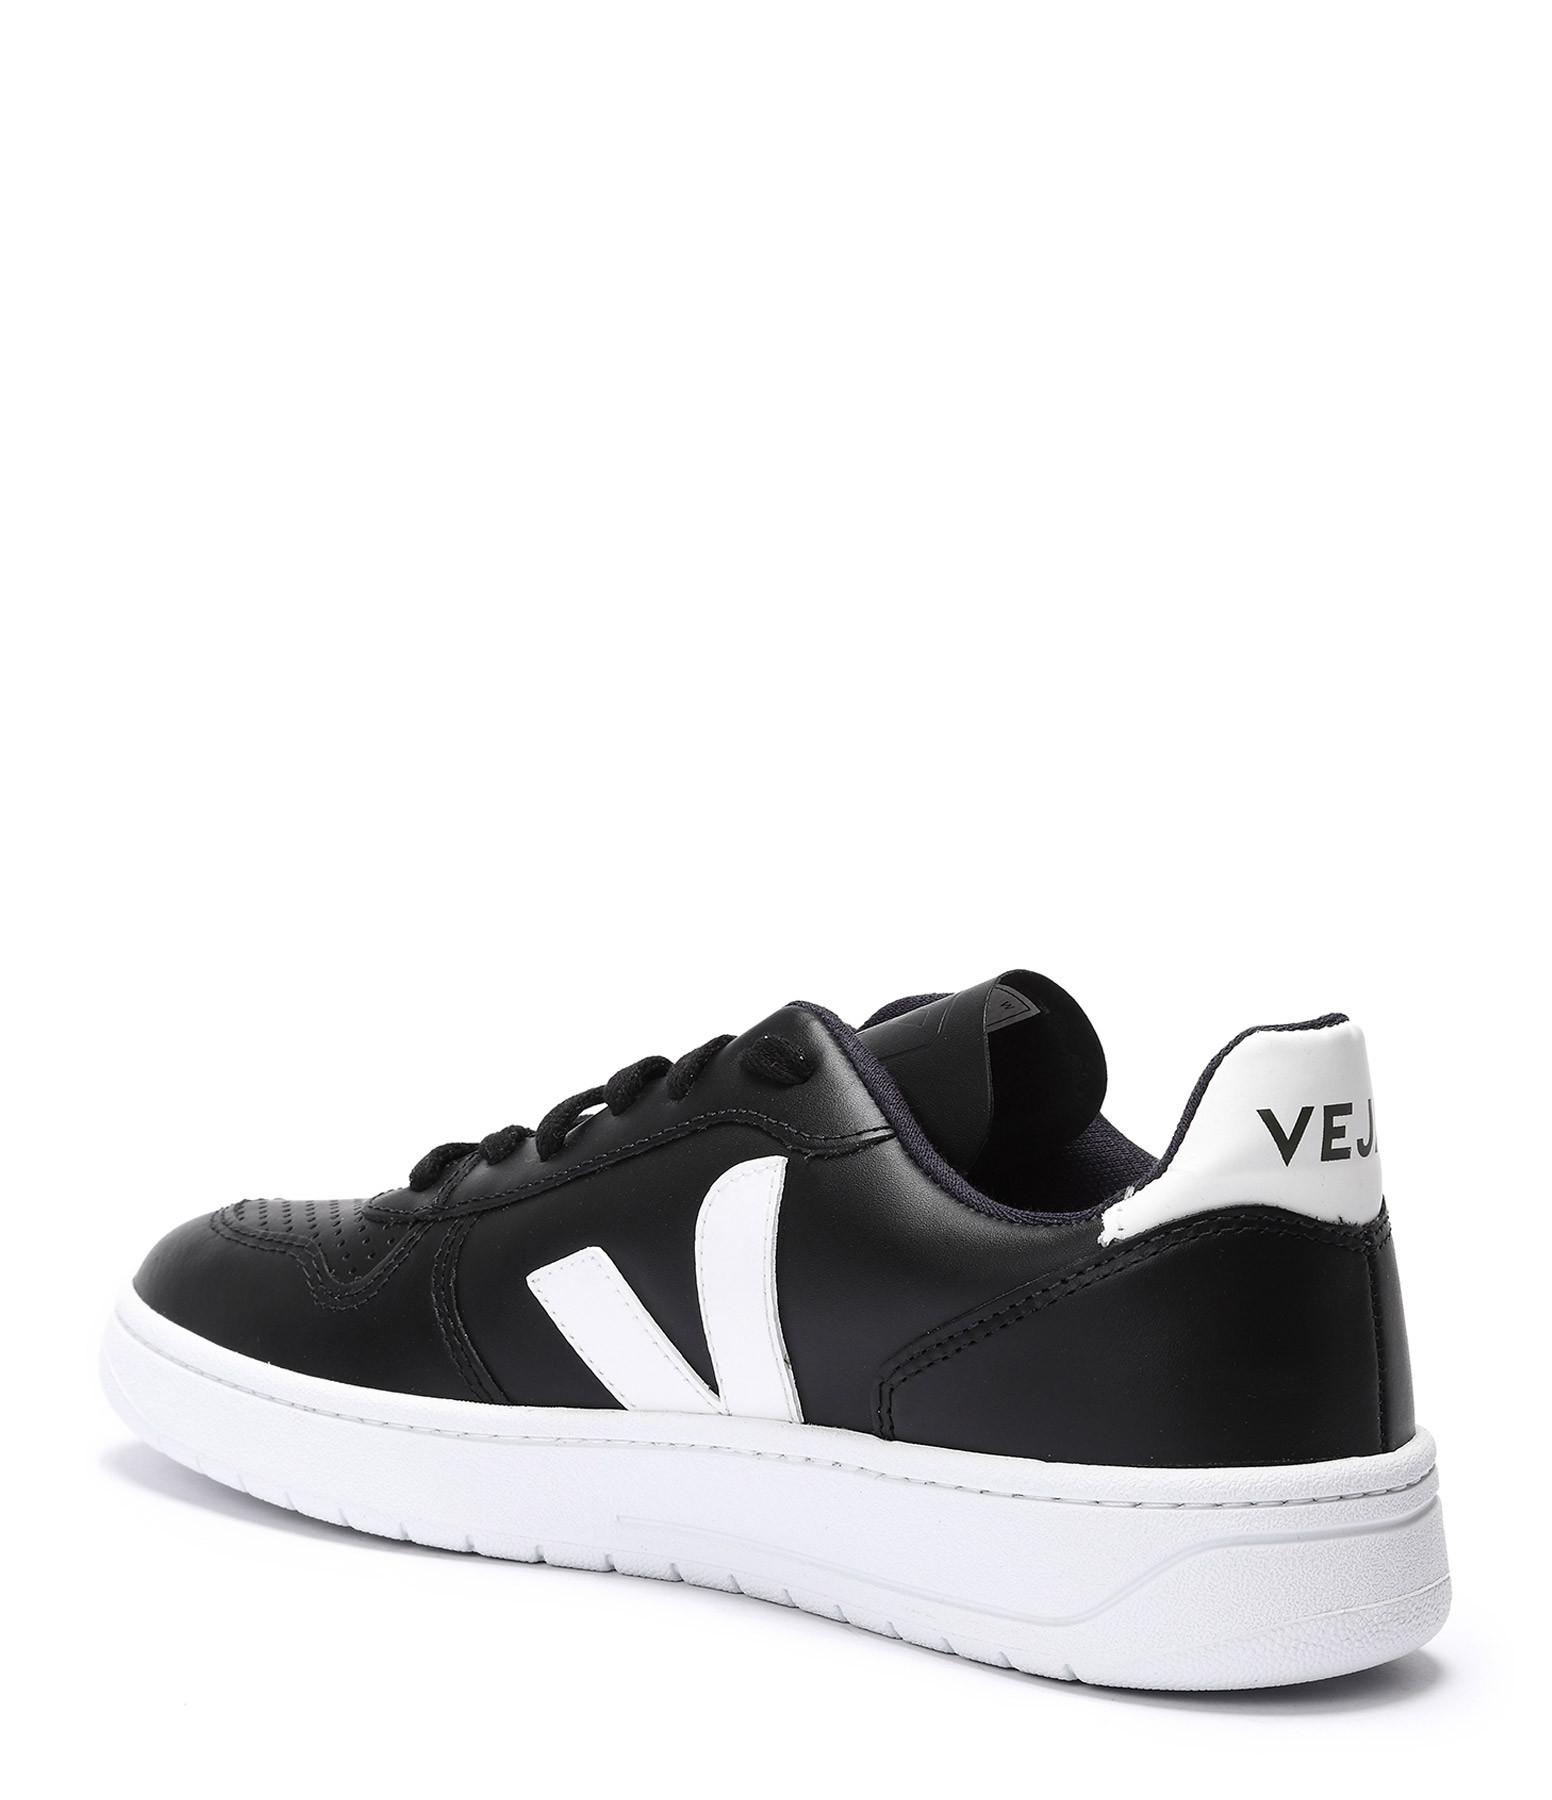 VEJA - Baskets V-10 Cuir Noir Blanc